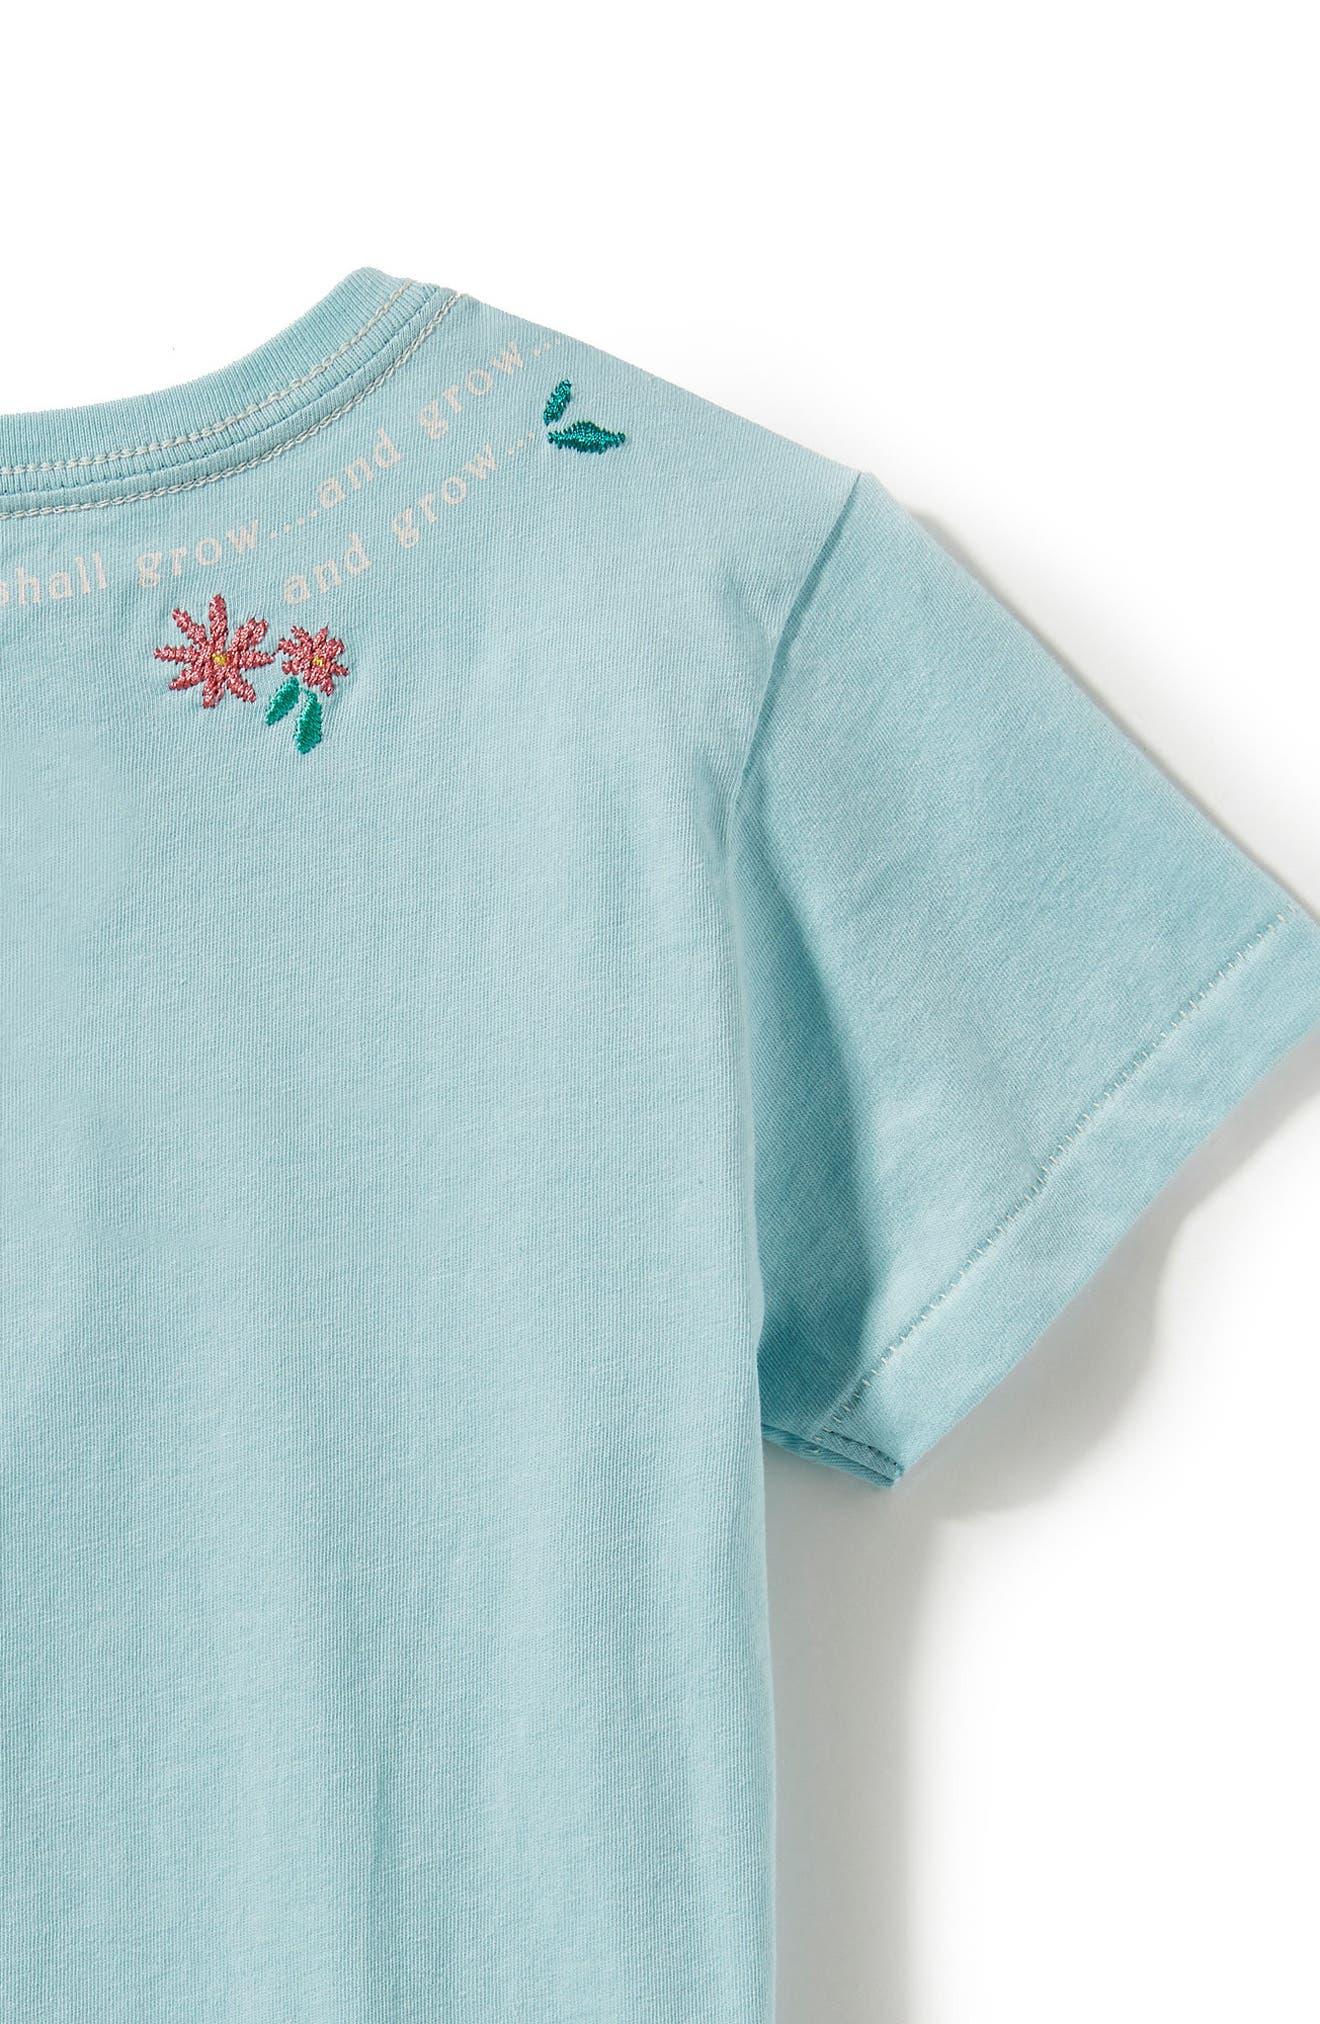 Alternate Image 2  - Peek Adventure Embroidered Tee (Toddler Girls, Little Girls & Big Girls)